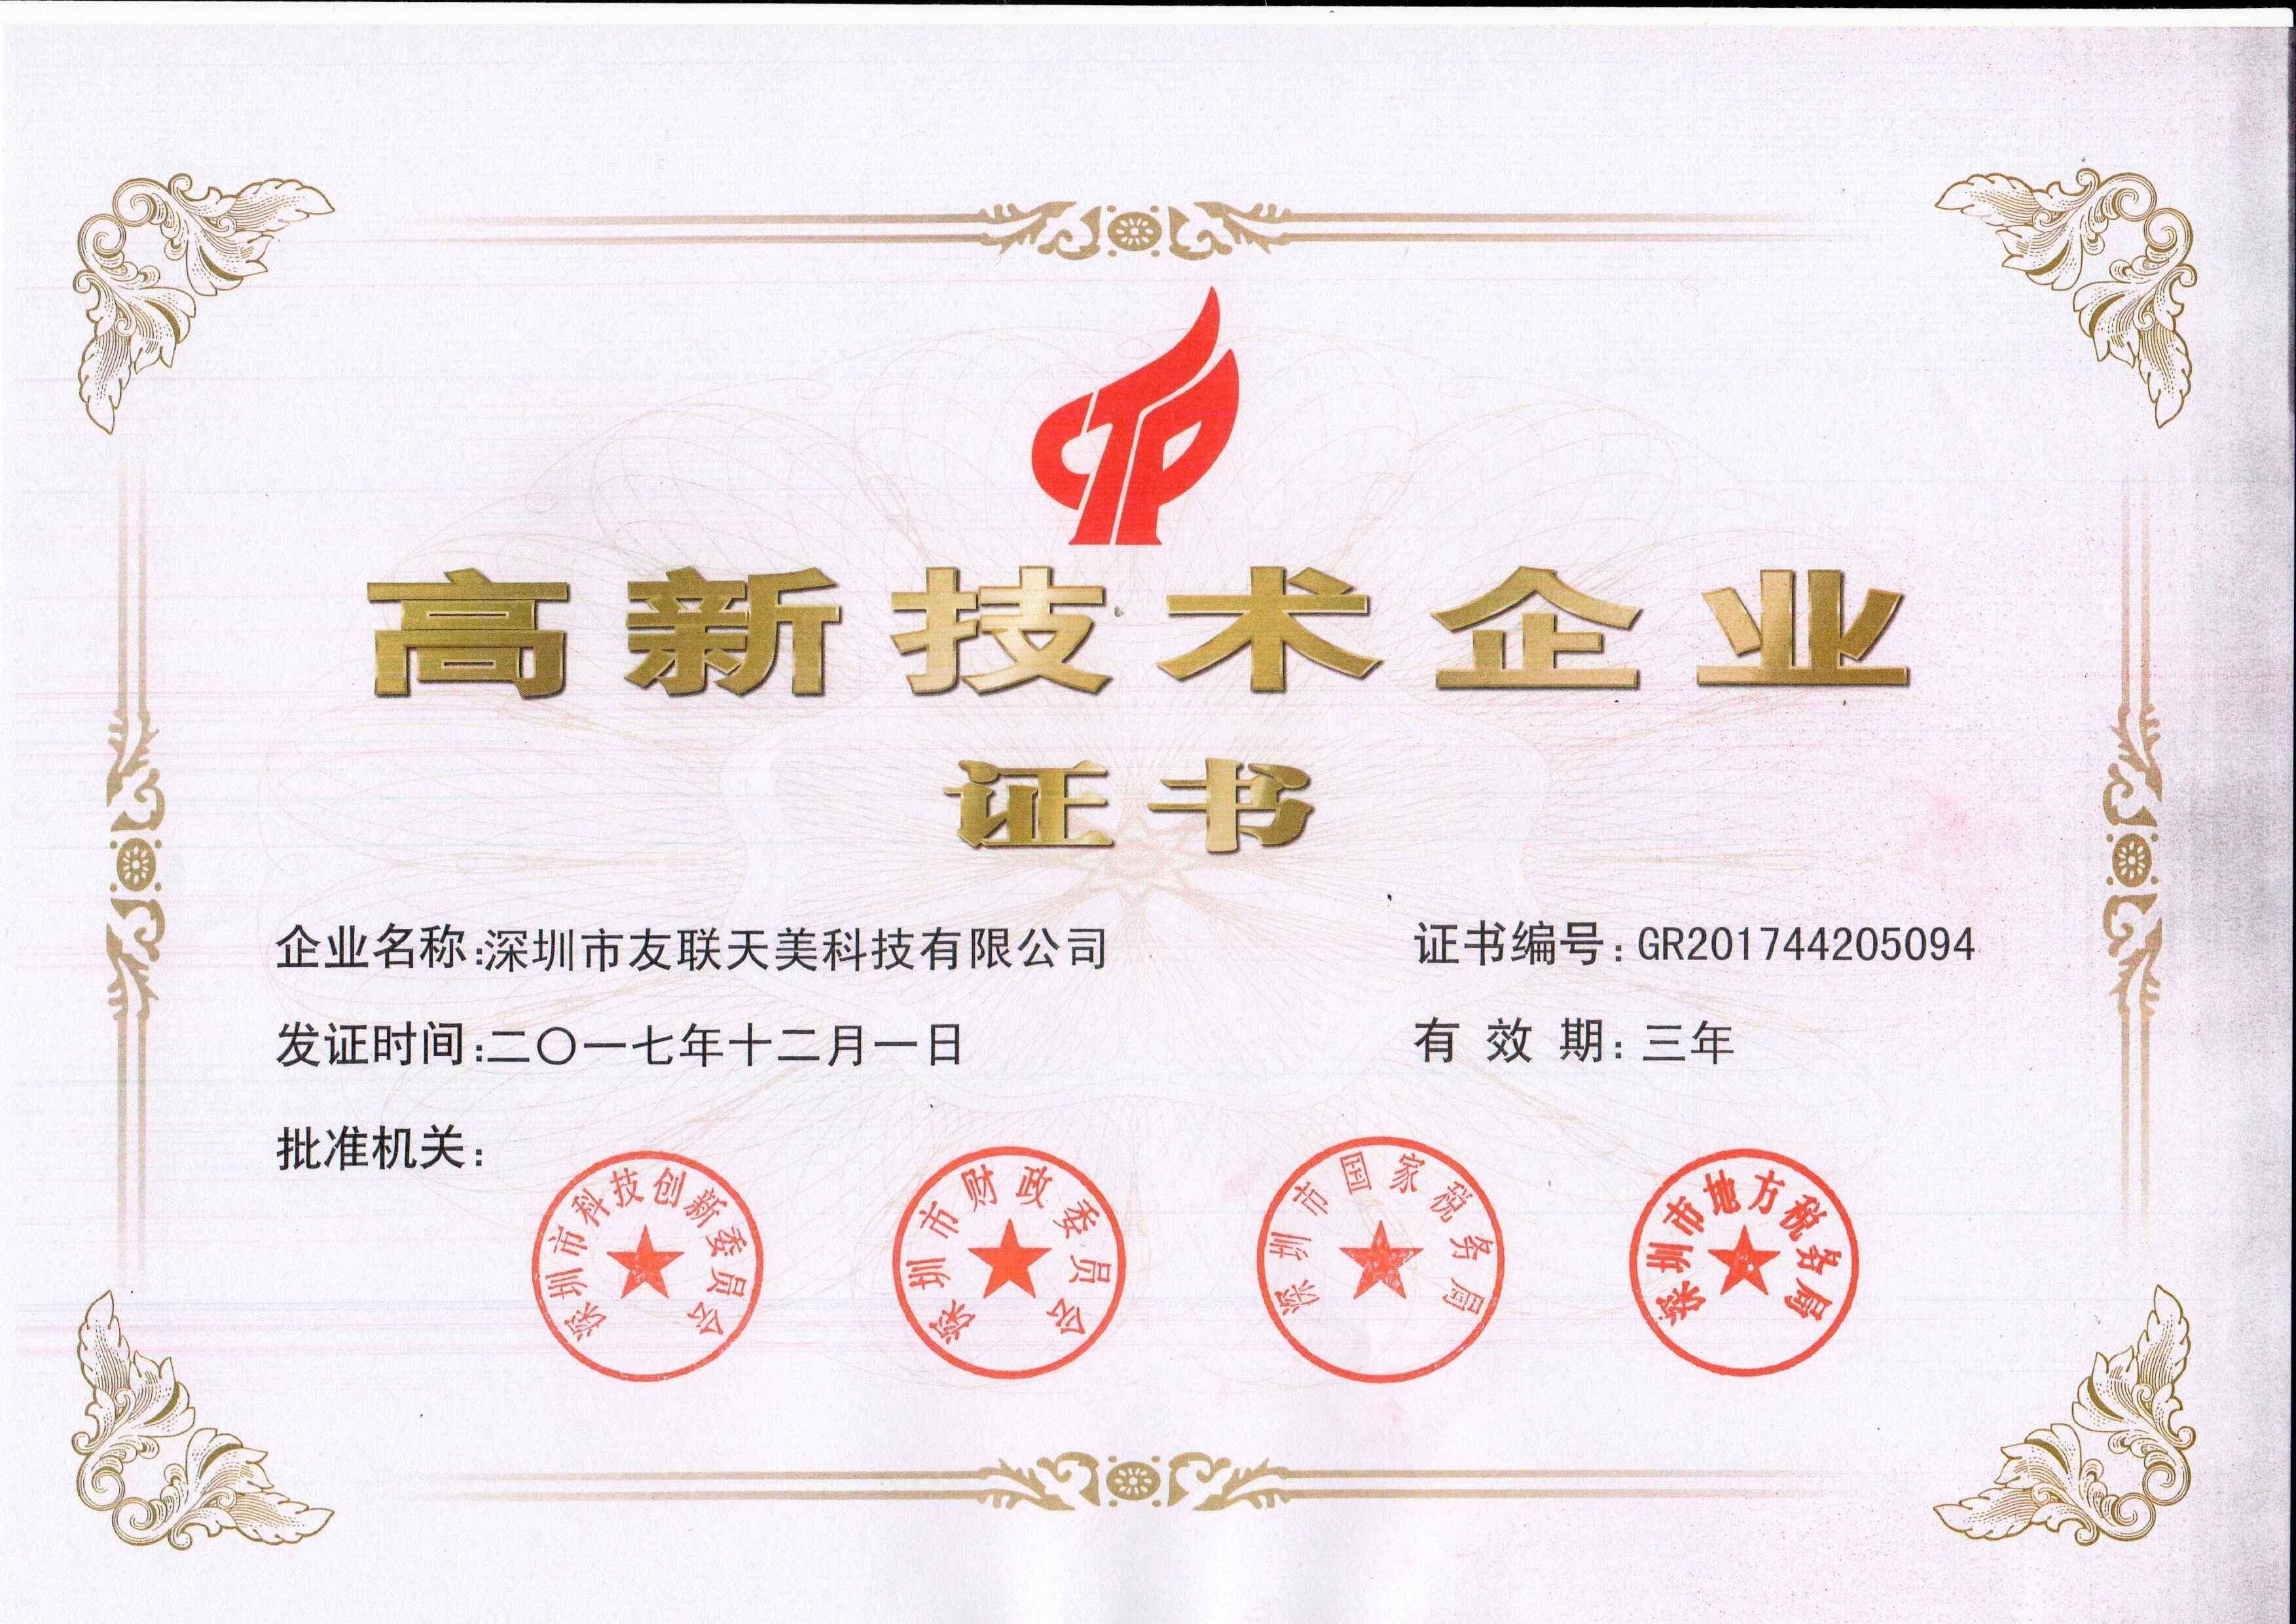 Shenzhen Union Timmy Technology Co., Ltd